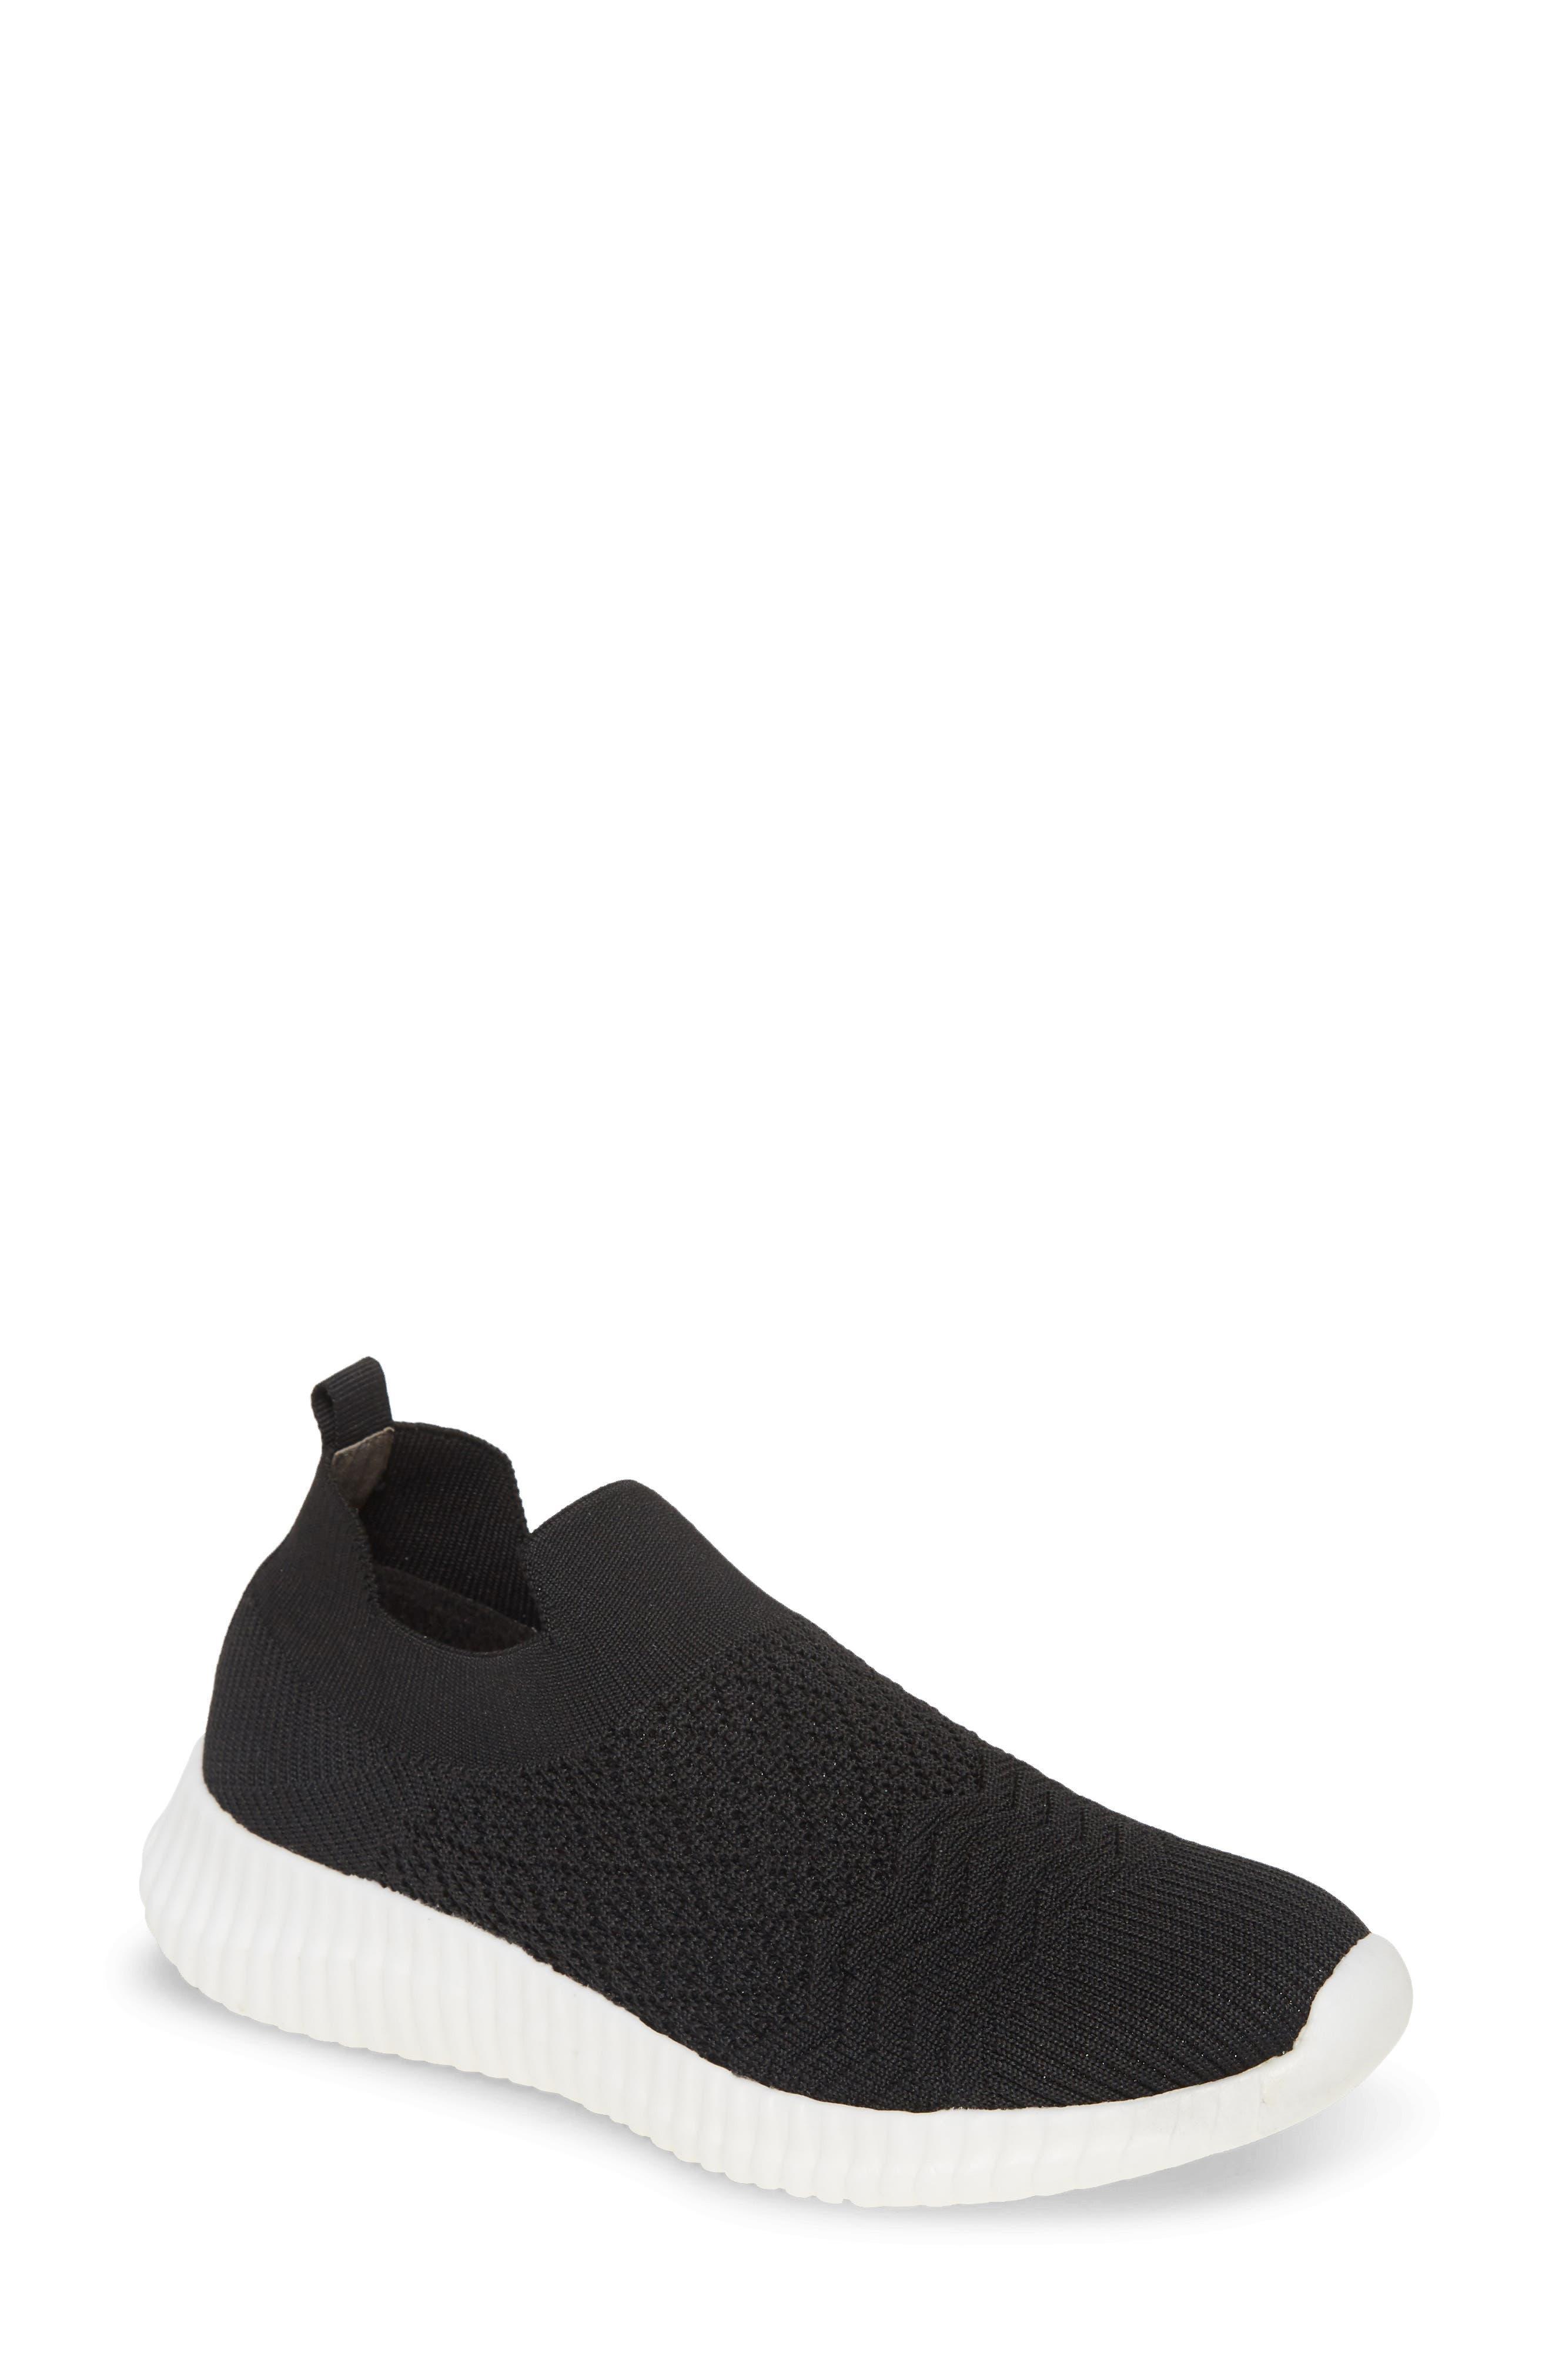 Tiptop Knit Sneaker